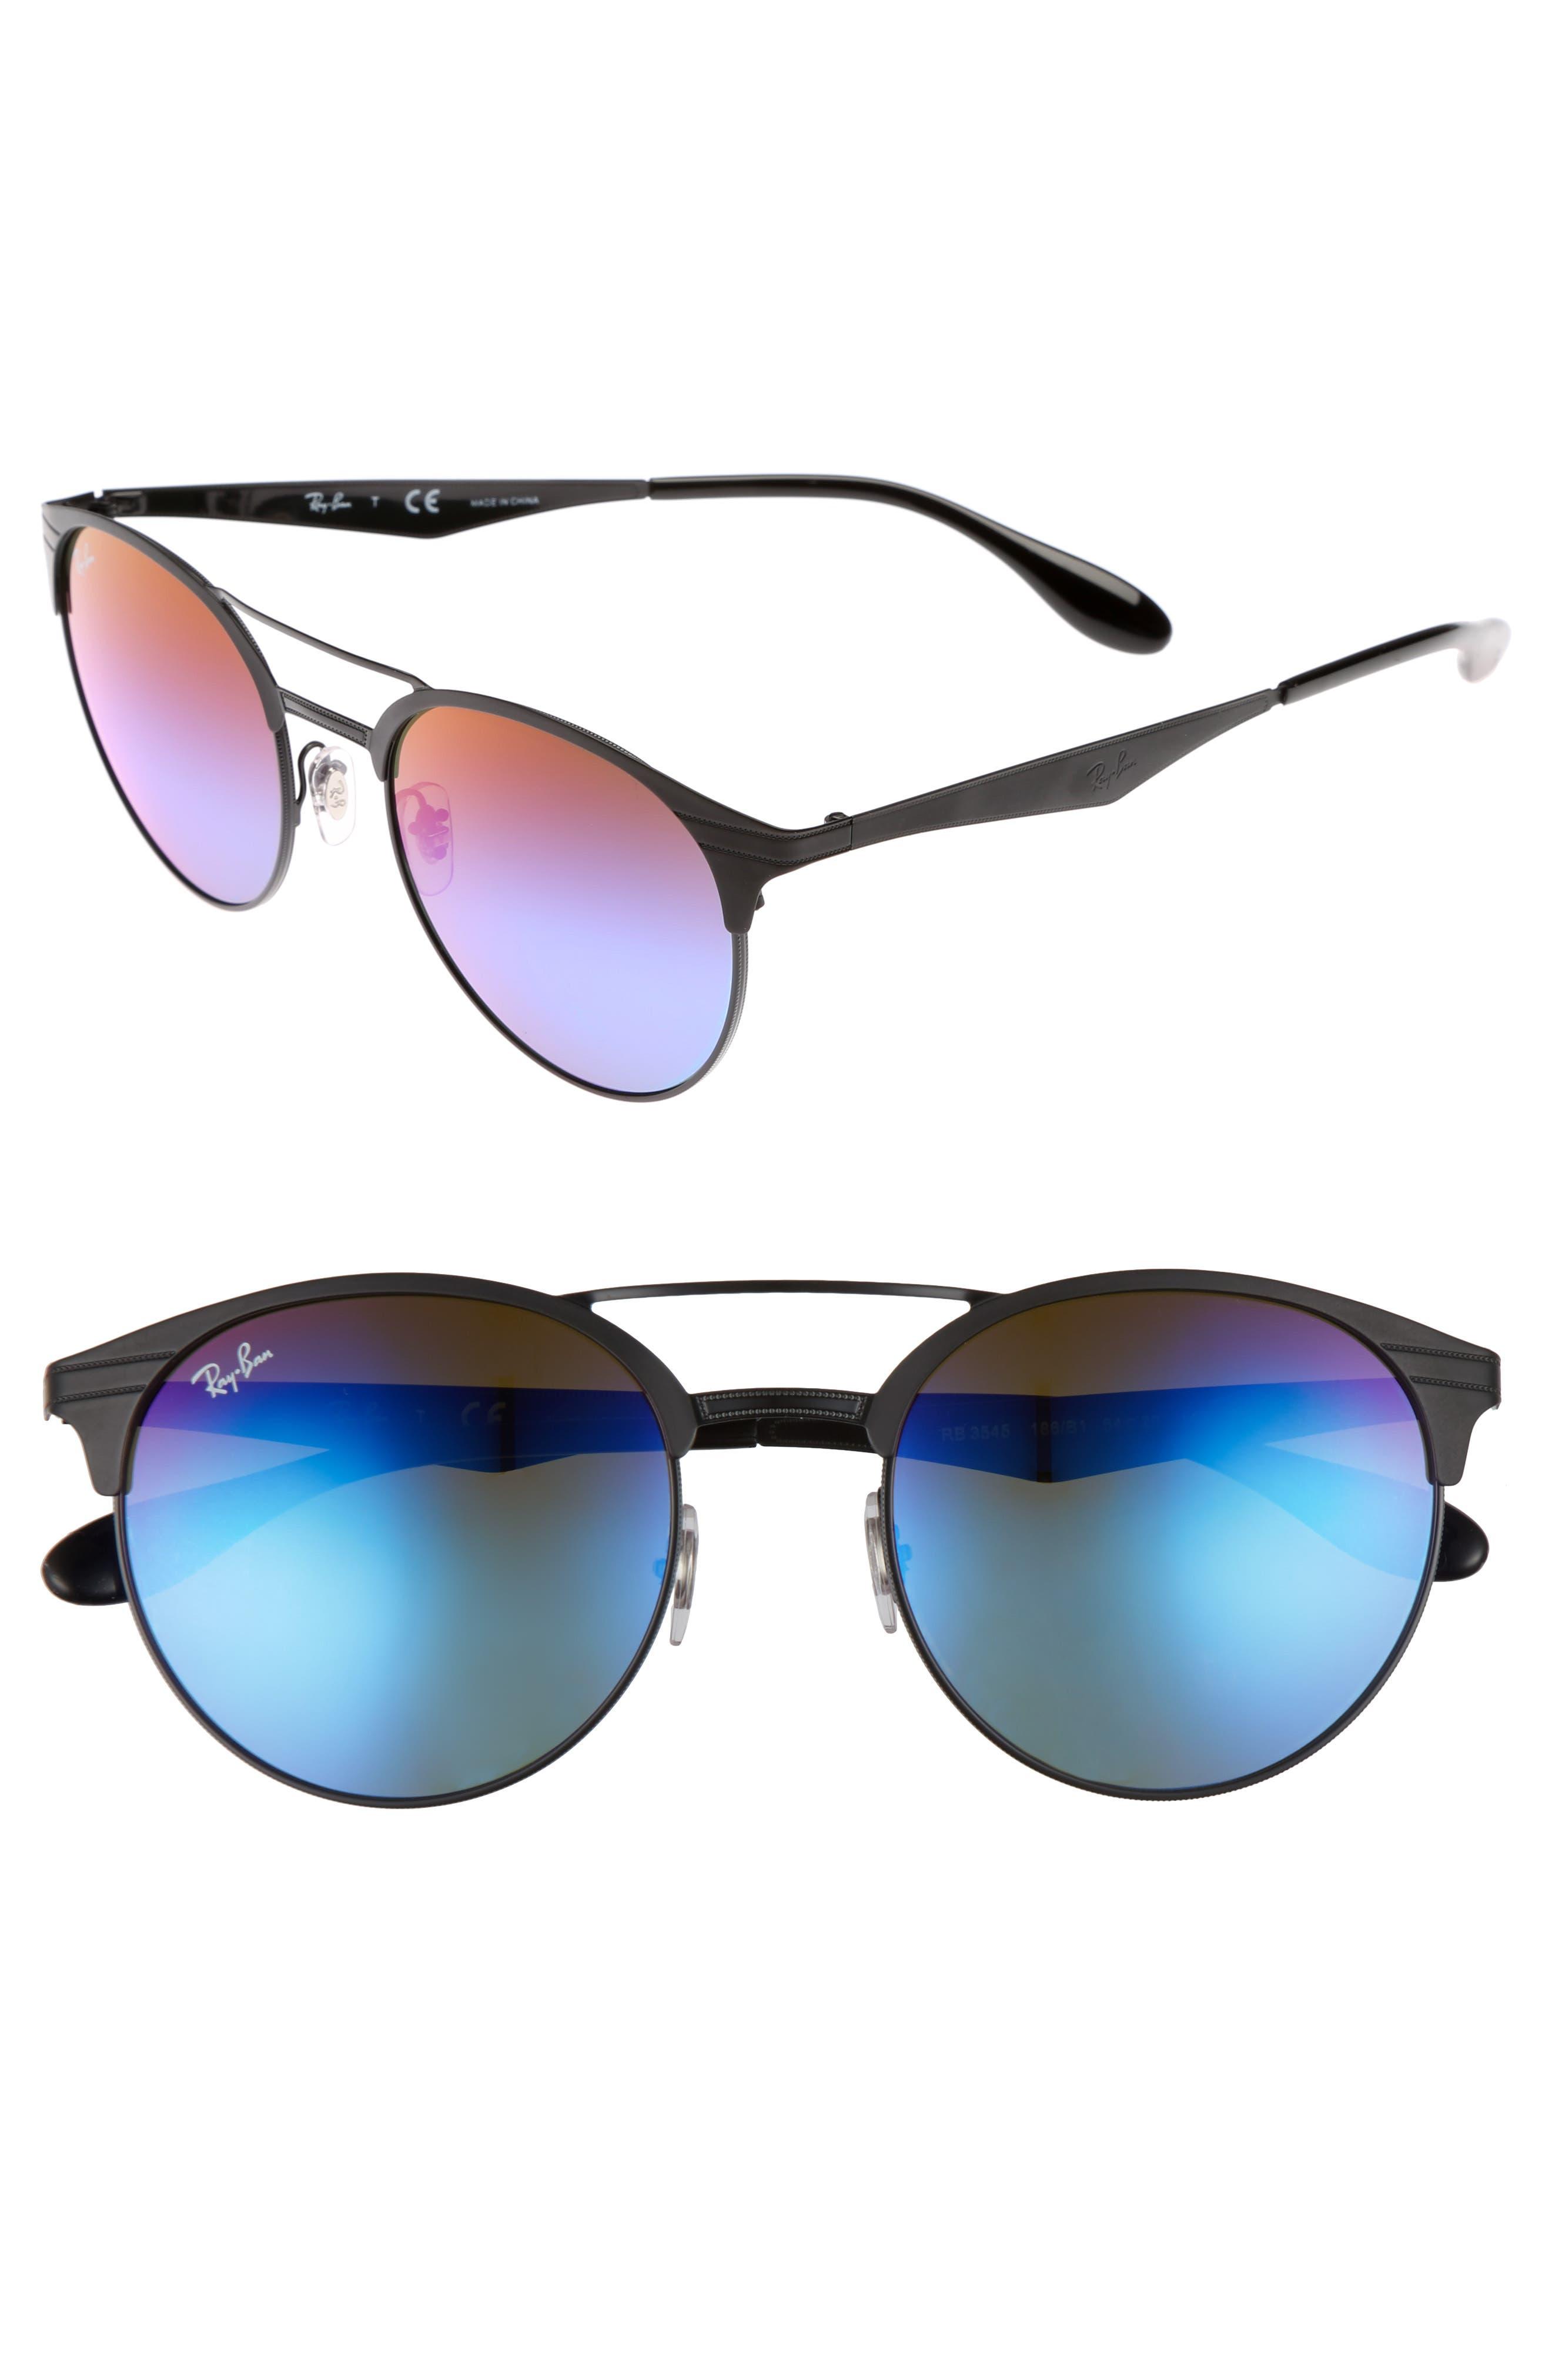 Highstreet 54mm Round Sunglasses,                         Main,                         color, Black/ Blue/ Violet